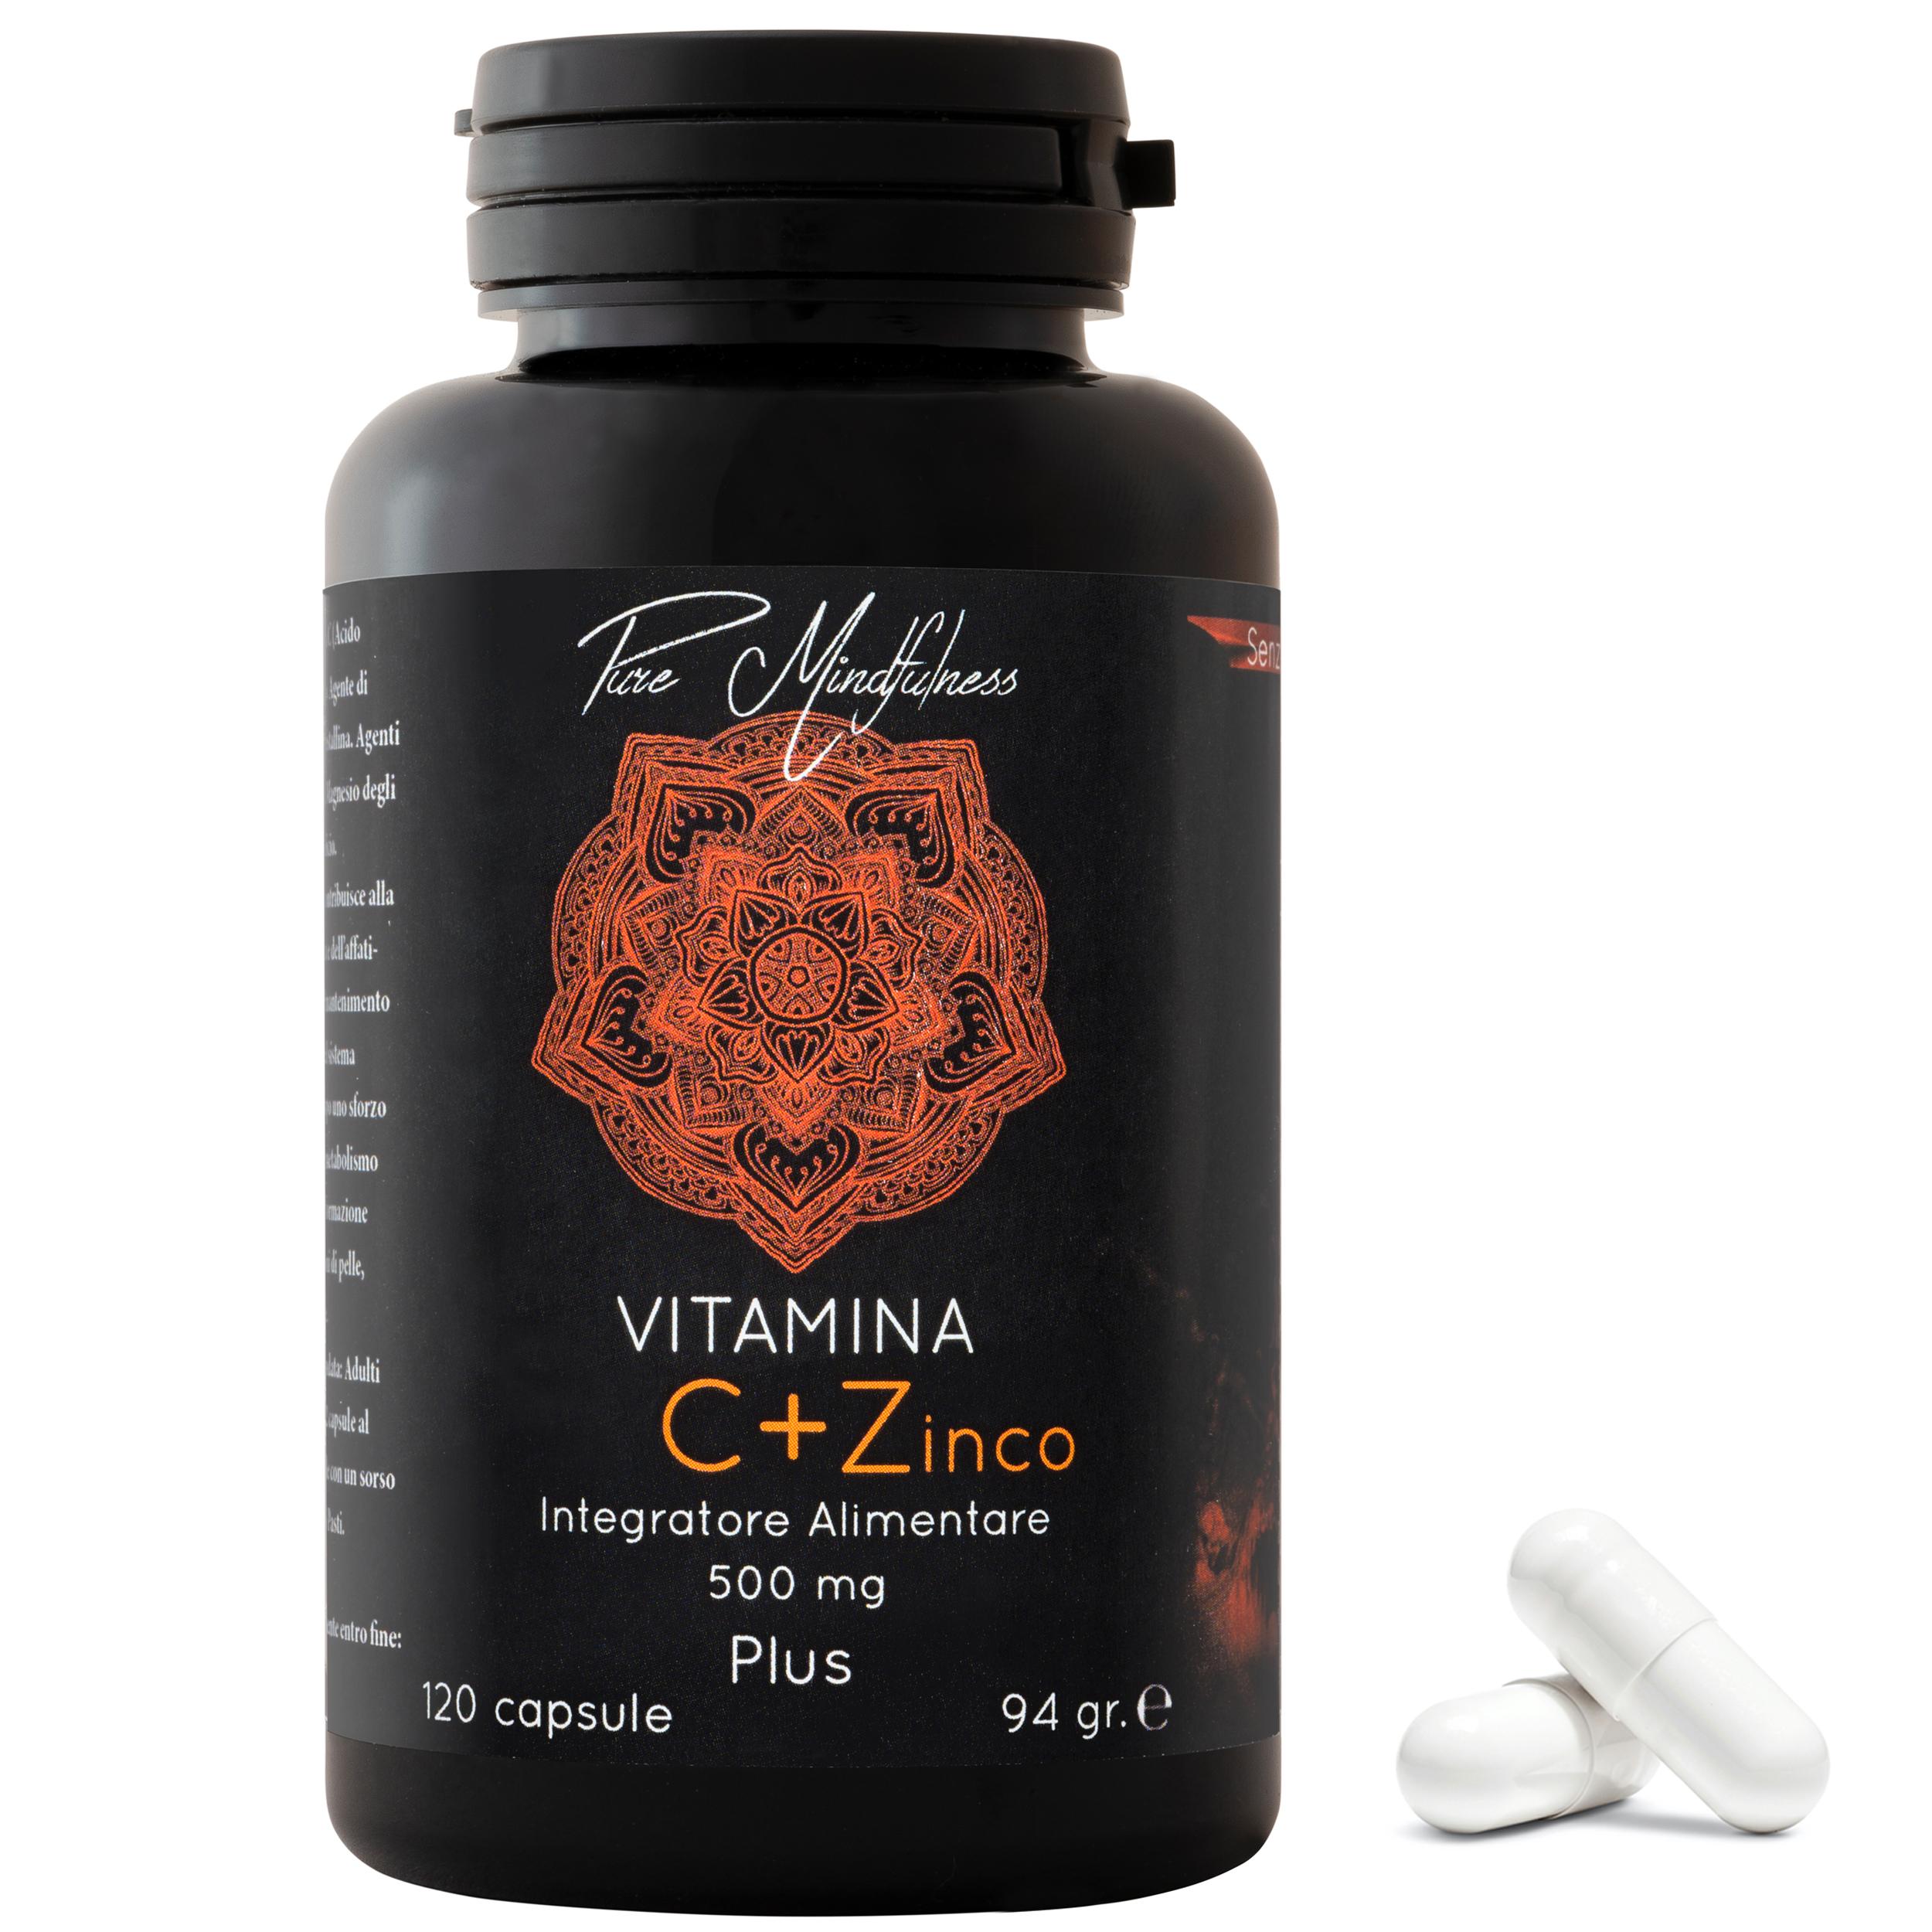 Vitamina C e zinco acido ascorbico _kolidur